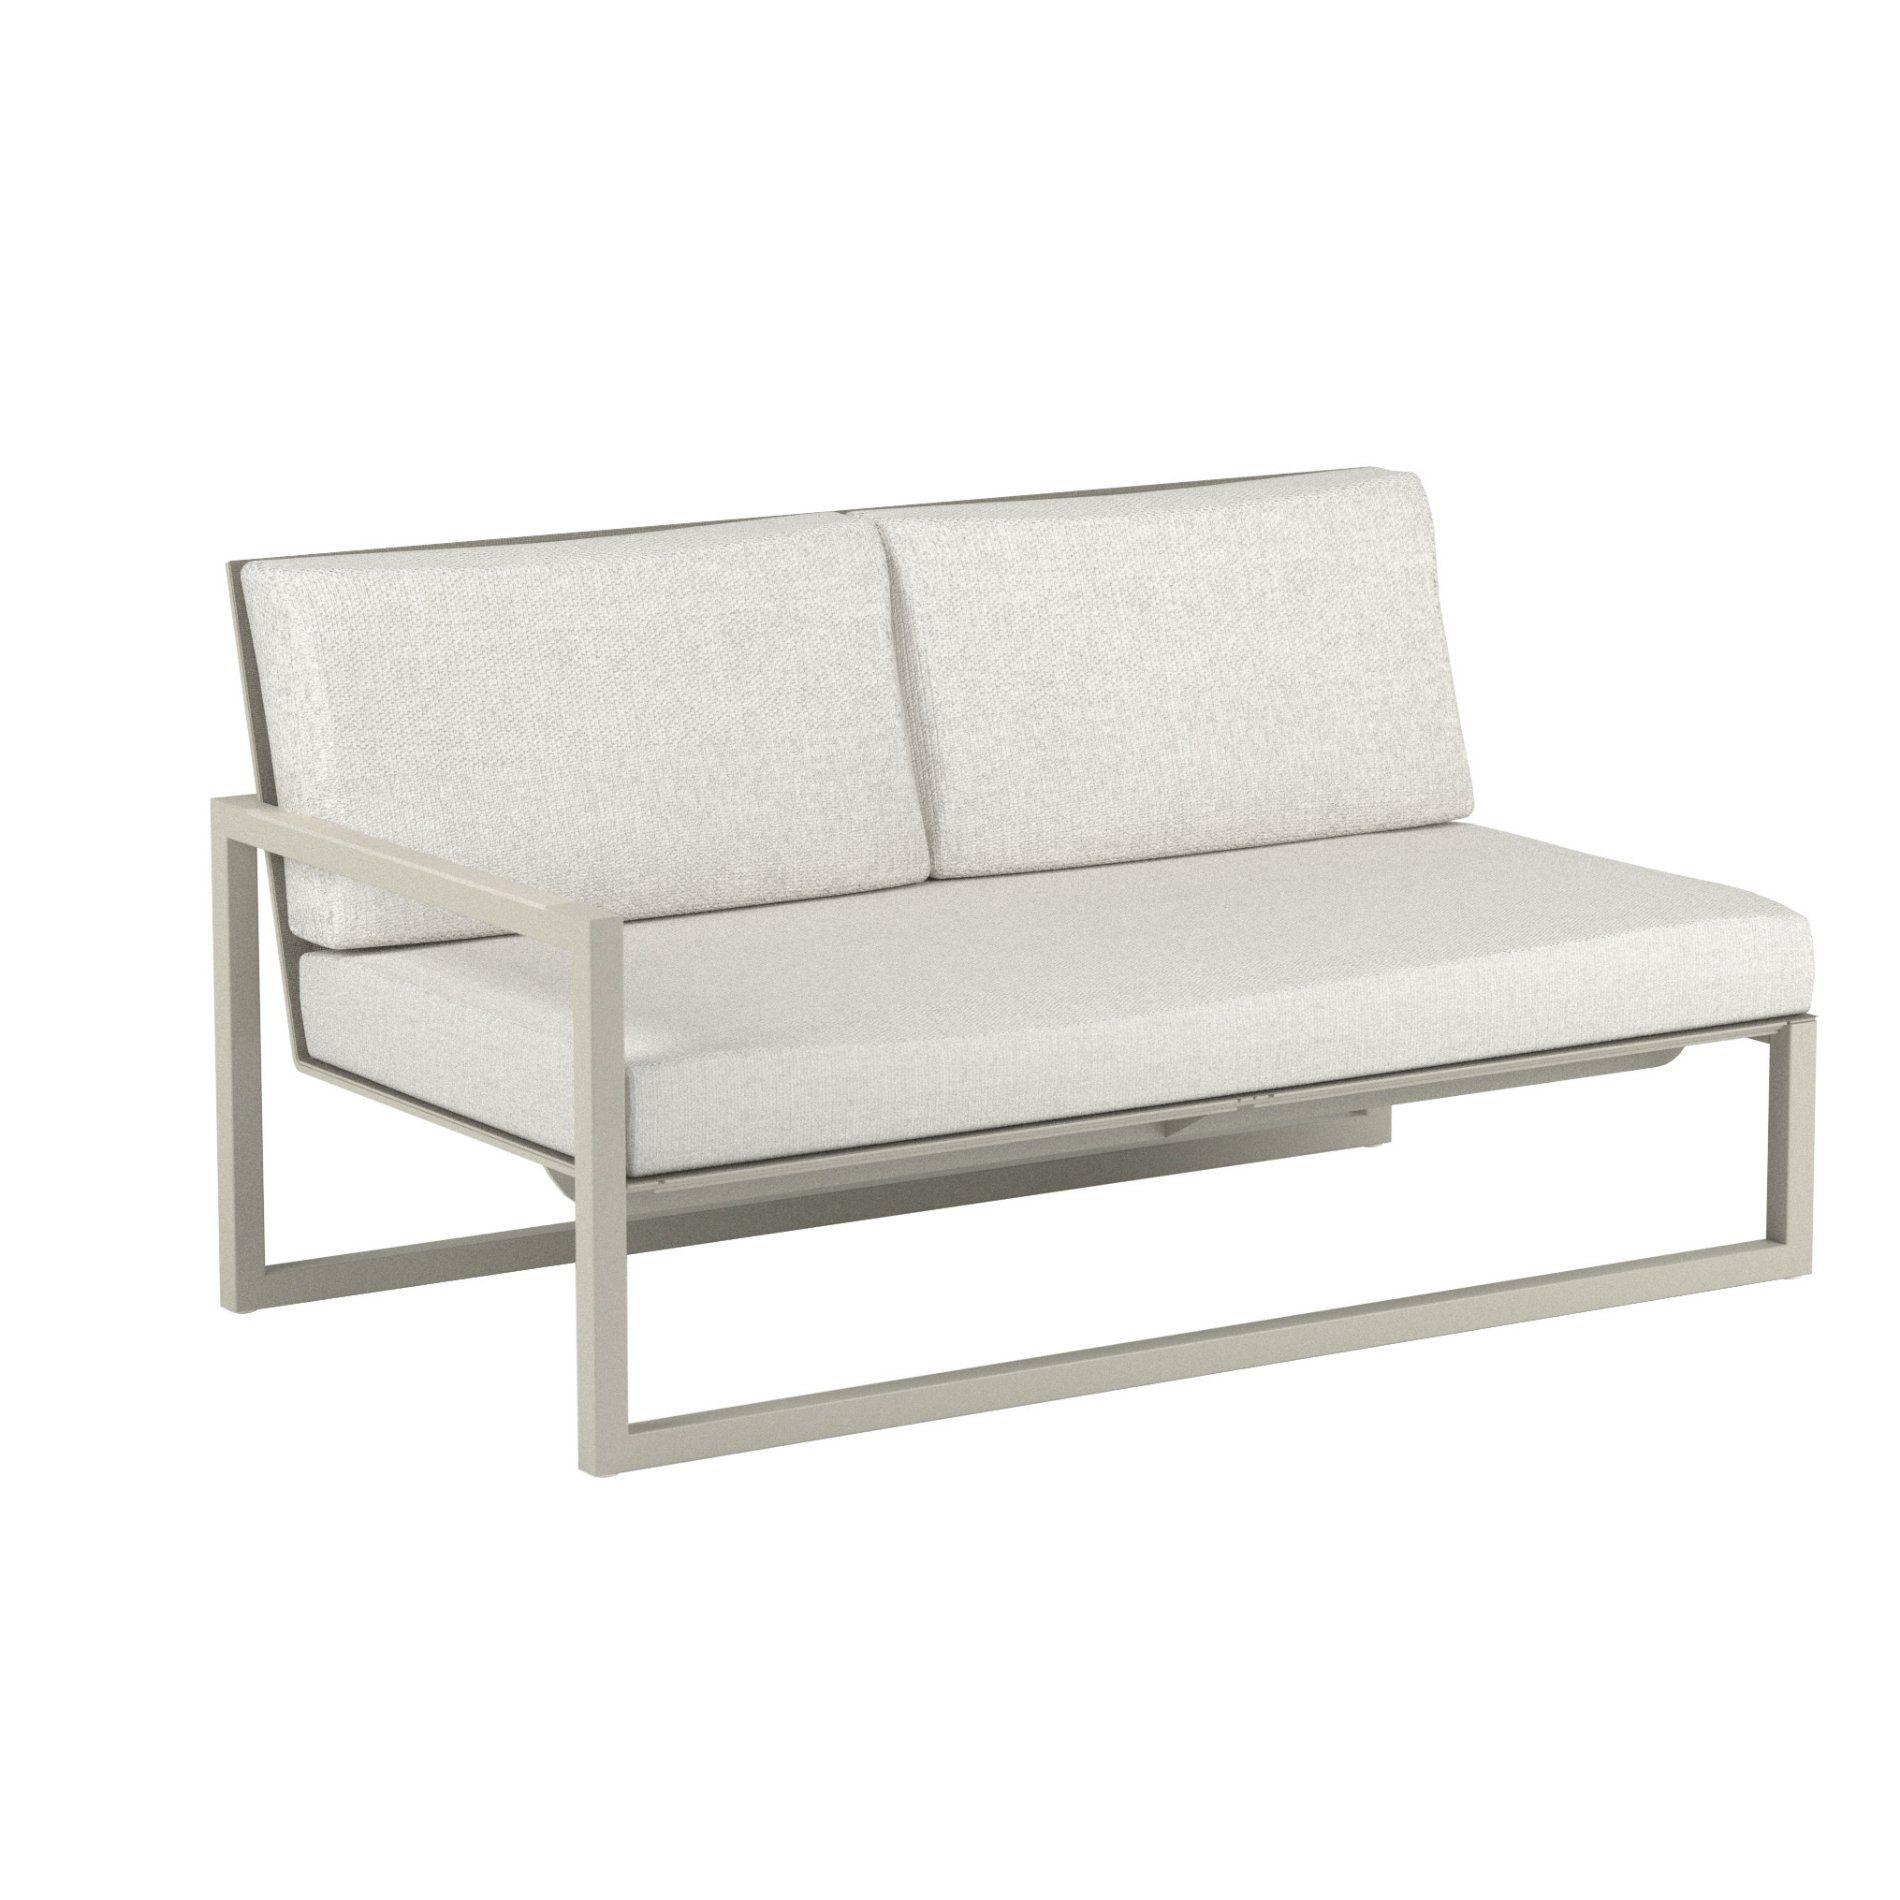 "Royal Botania ""Ninix 160"" 2-Sitzer-Seitenteil rechts, Gestell Aluminium sand, Bespannung Textilgewebe pearl grey, Kissen Ecru"